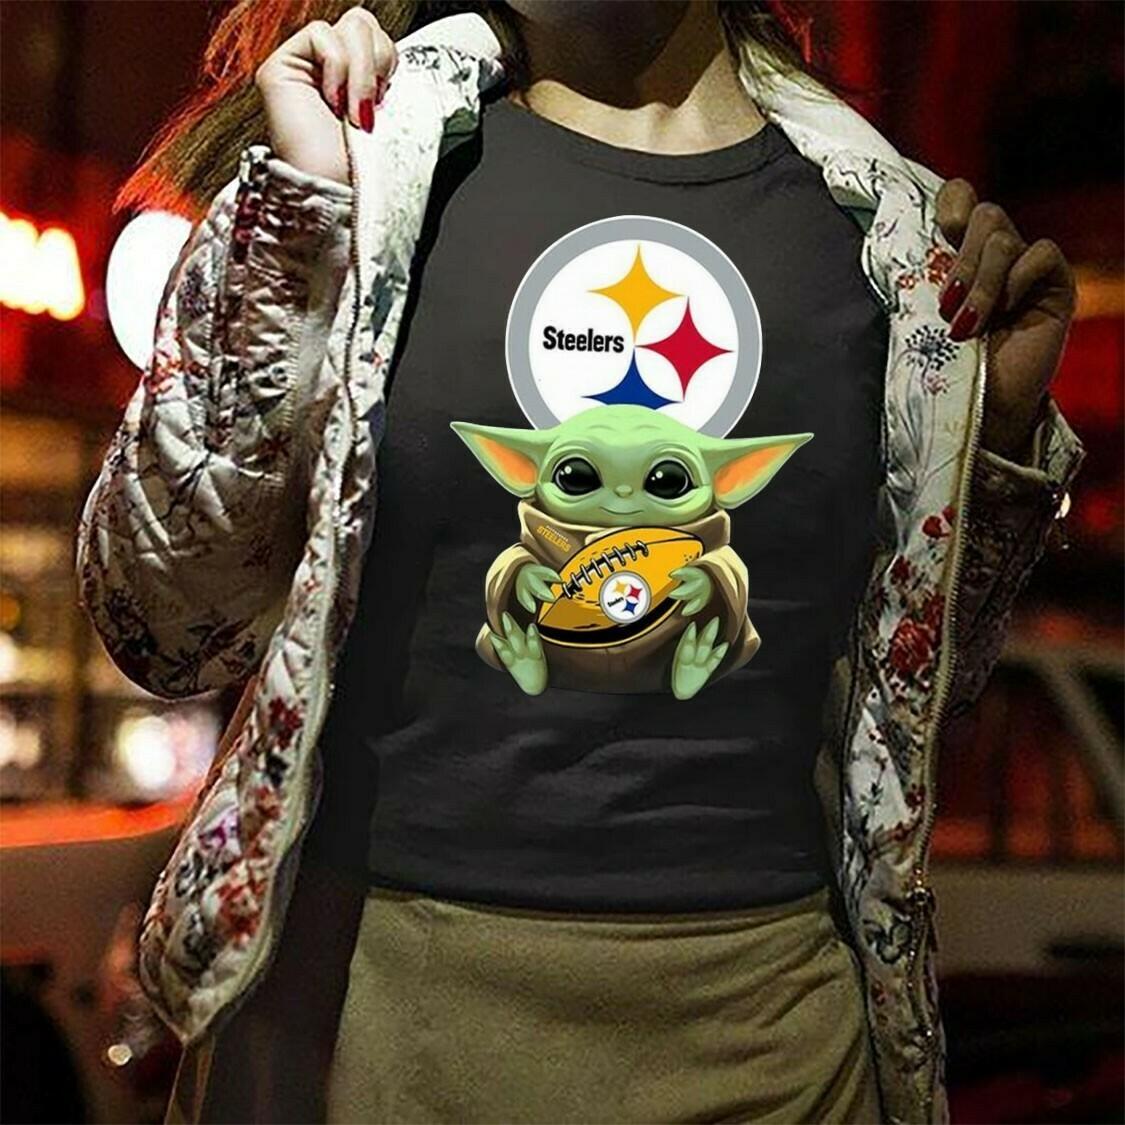 Pittsburgh Steelers Baby Yoda Star Wars The Mandalorian The Child First Memories Floating NBA Football Dad Mon Kid Fan Gift T-Shirt Long Sleeve Sweatshirt Hoodie Jolly Family Gifts